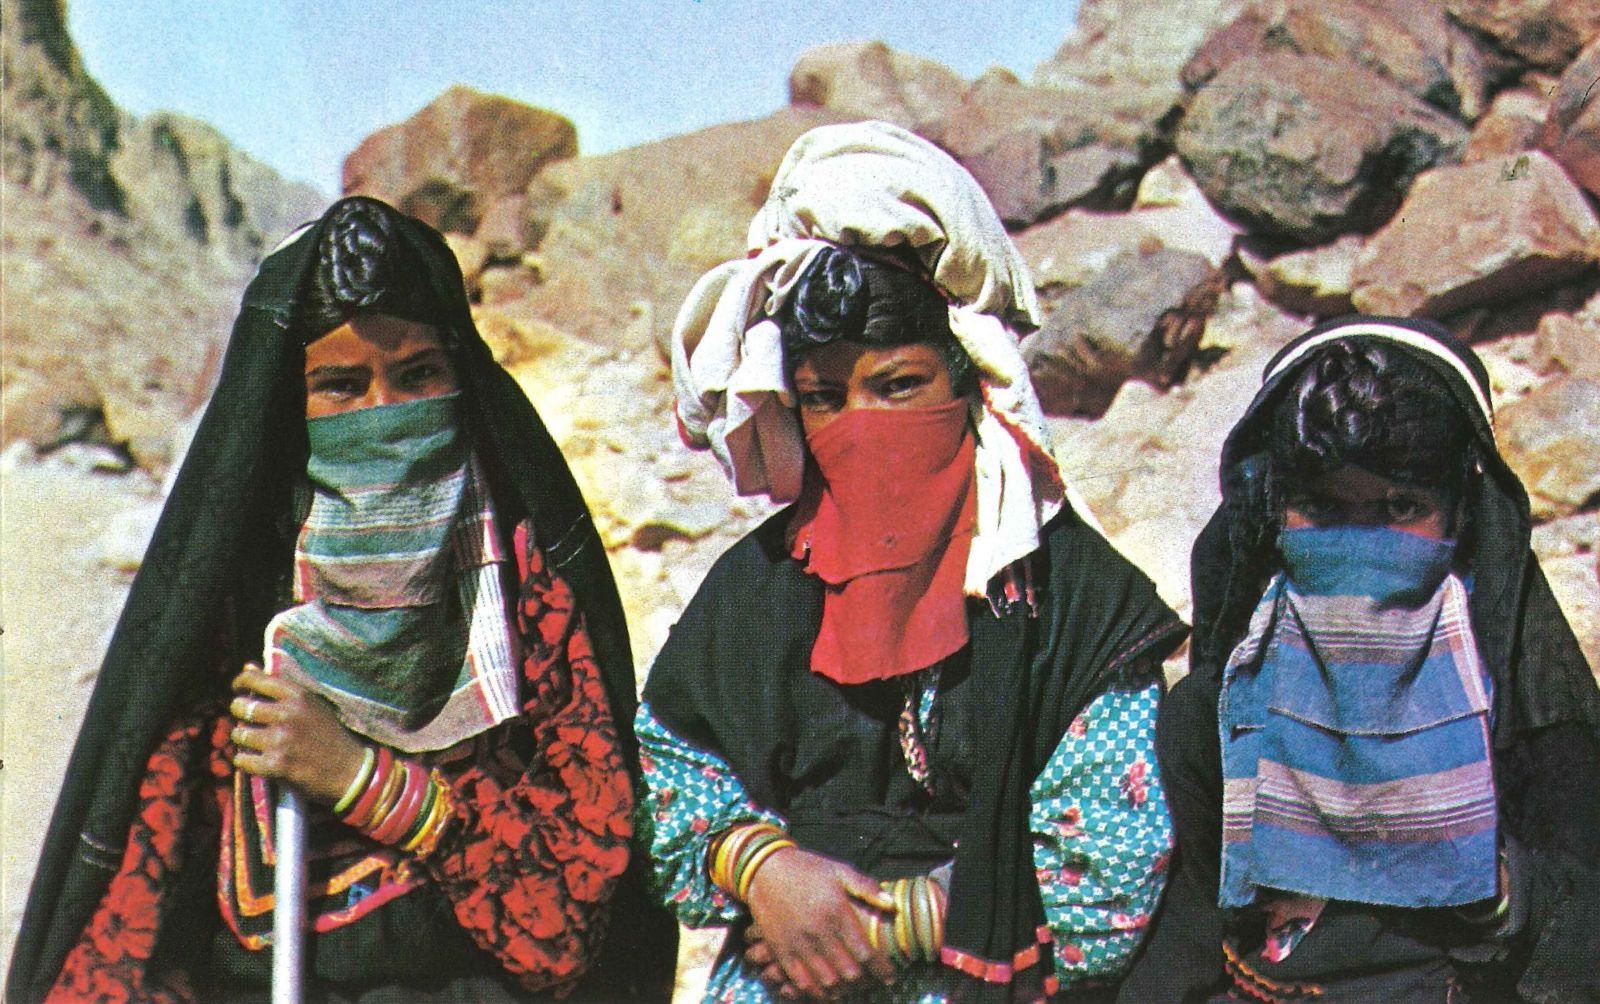 Israel's Ancient Bedouin Culture Gets New Life Online